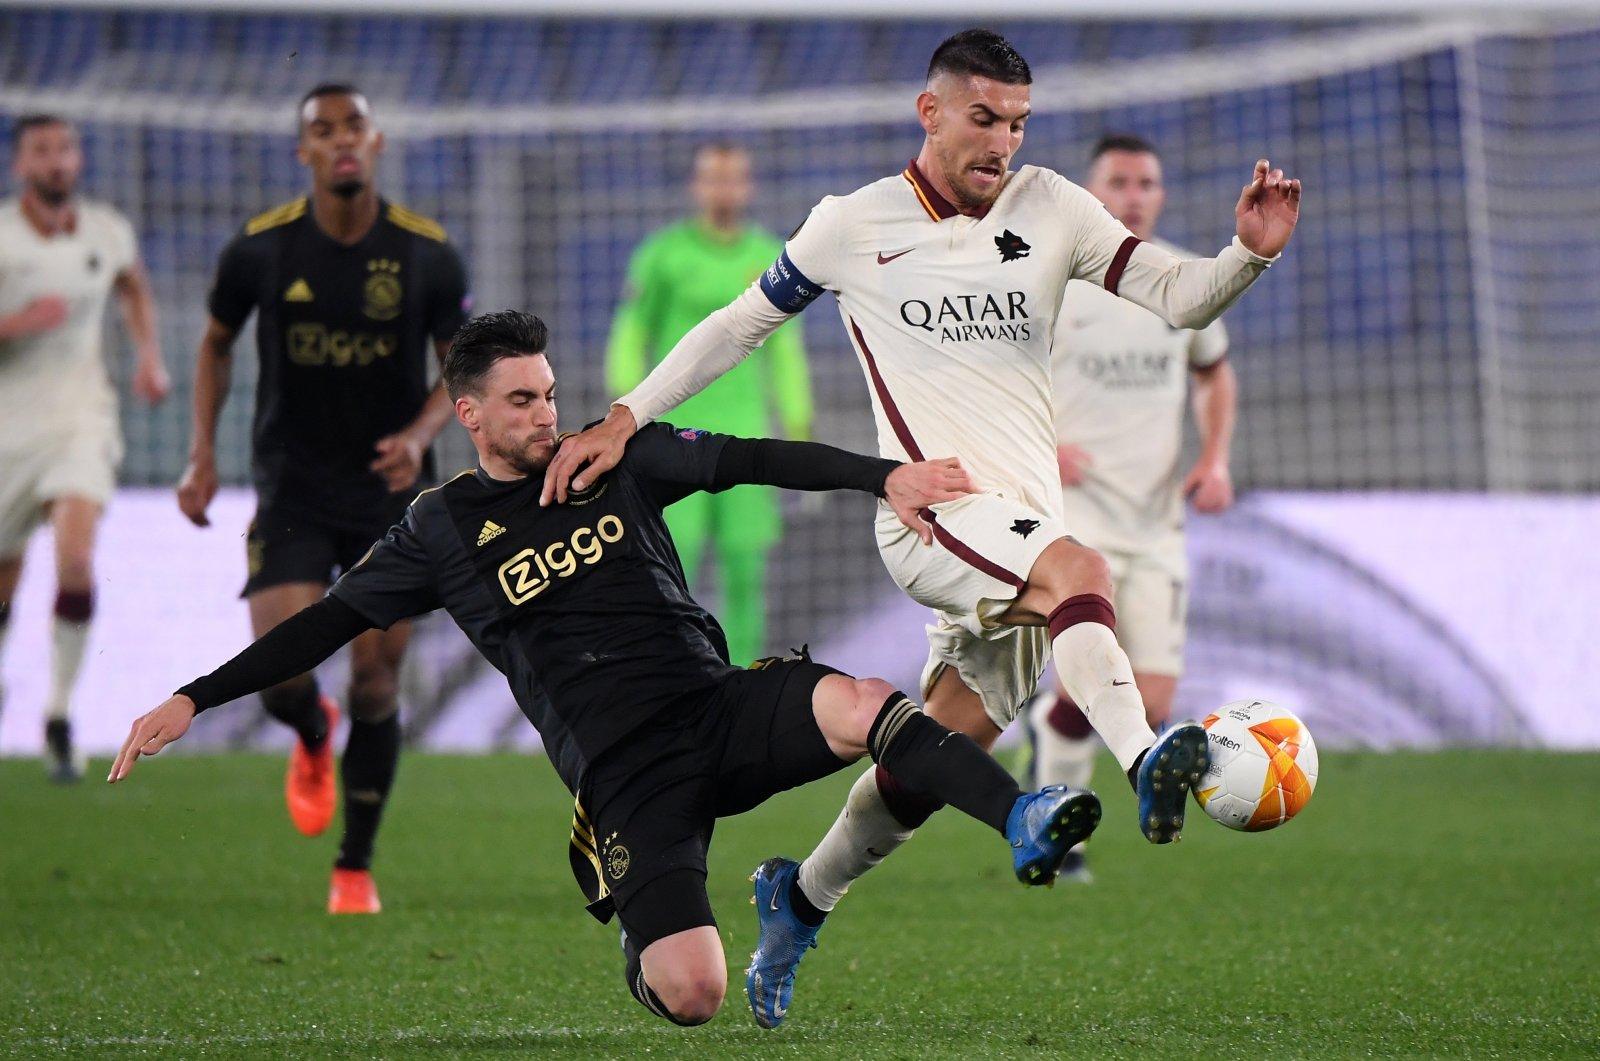 Ajax Amsterdam's Lisandro Martinez (L) in action against AS Roma's Lorenzo Pellegrini at Stadio Olimpico, Rome, Italy, April 15, 2021. (Reuters Photo)